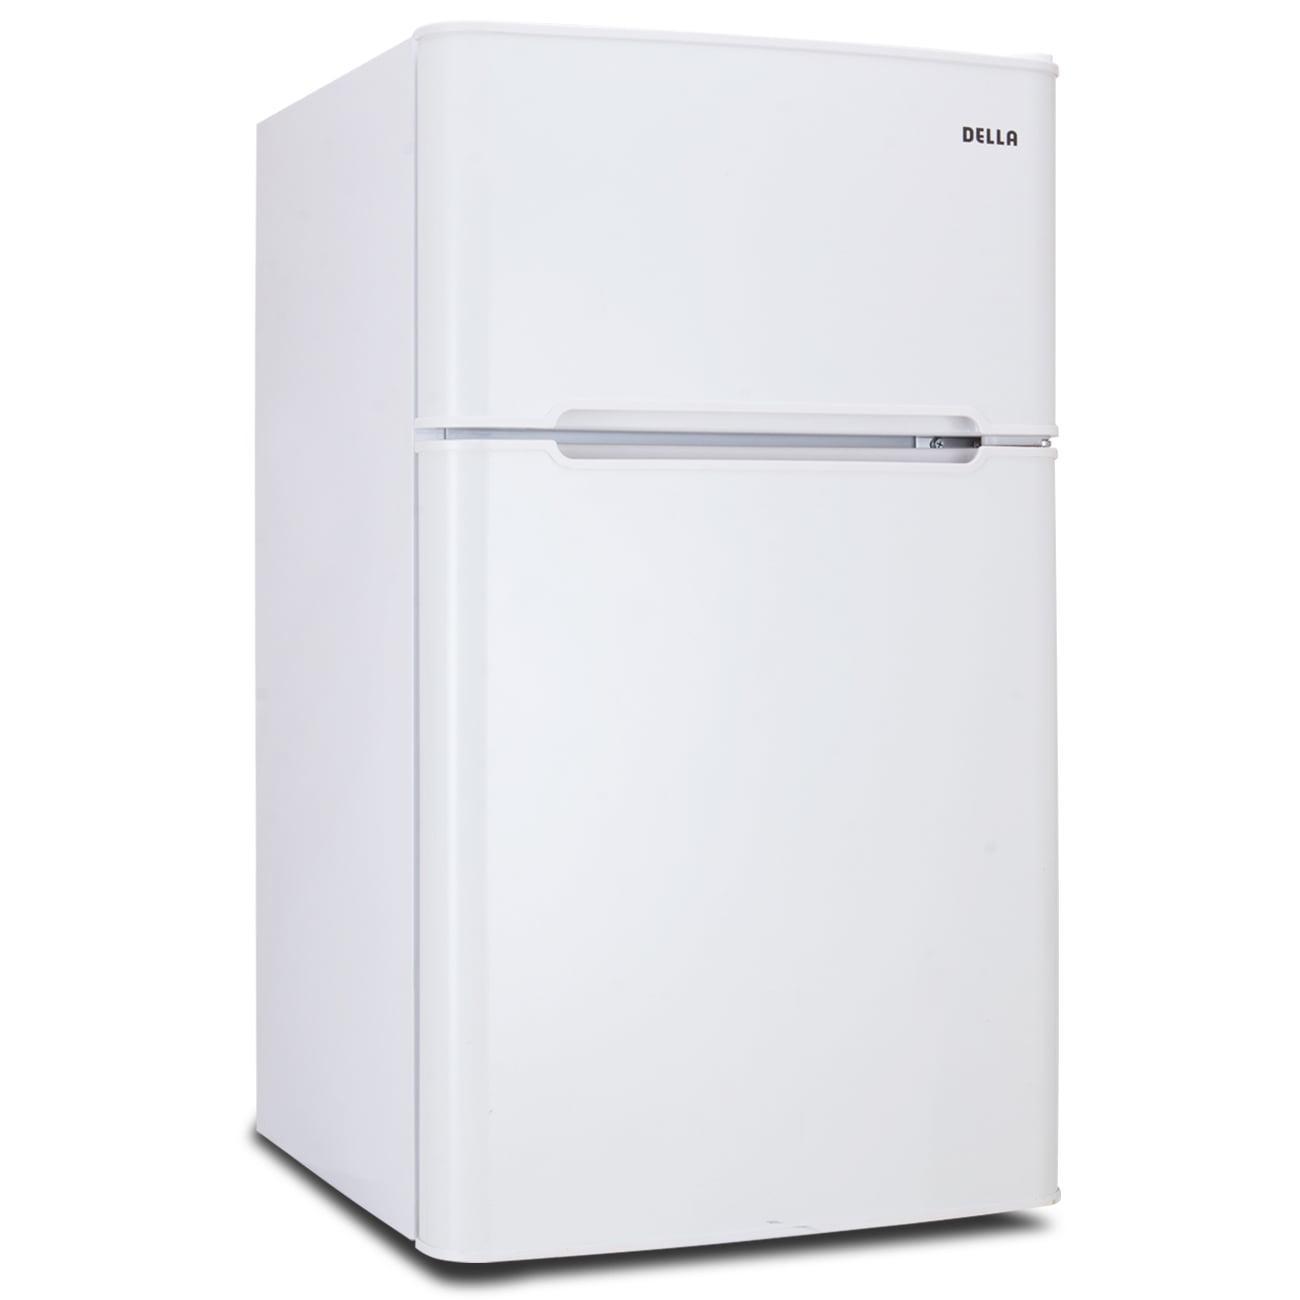 Della Refrigerator with Freezer Double Door Compact Fridge, White